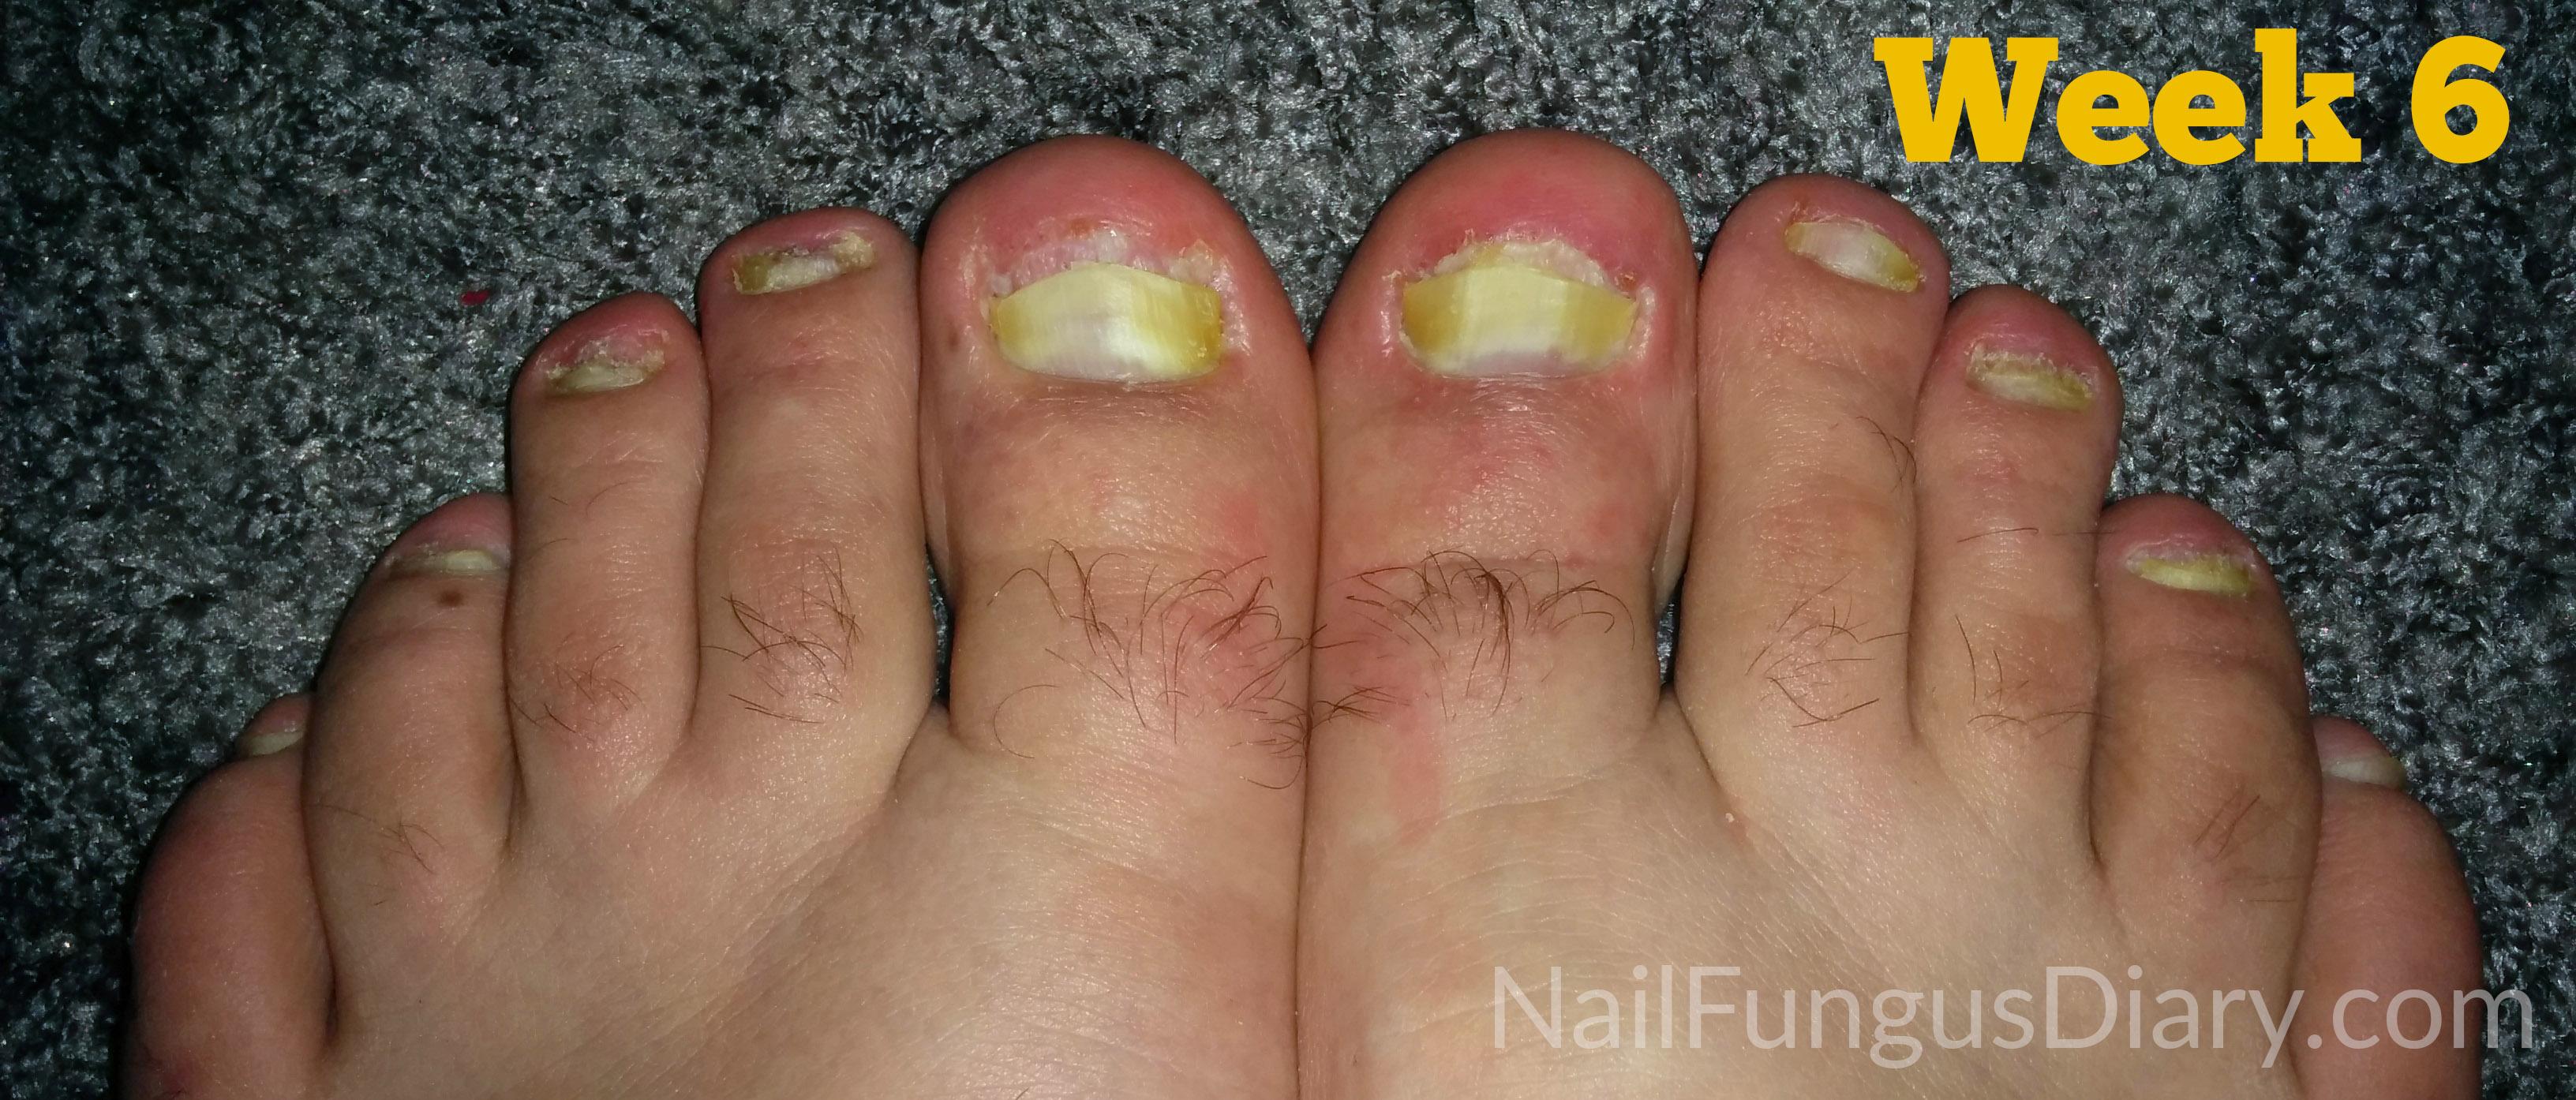 Nail Fungus Update, February 2015